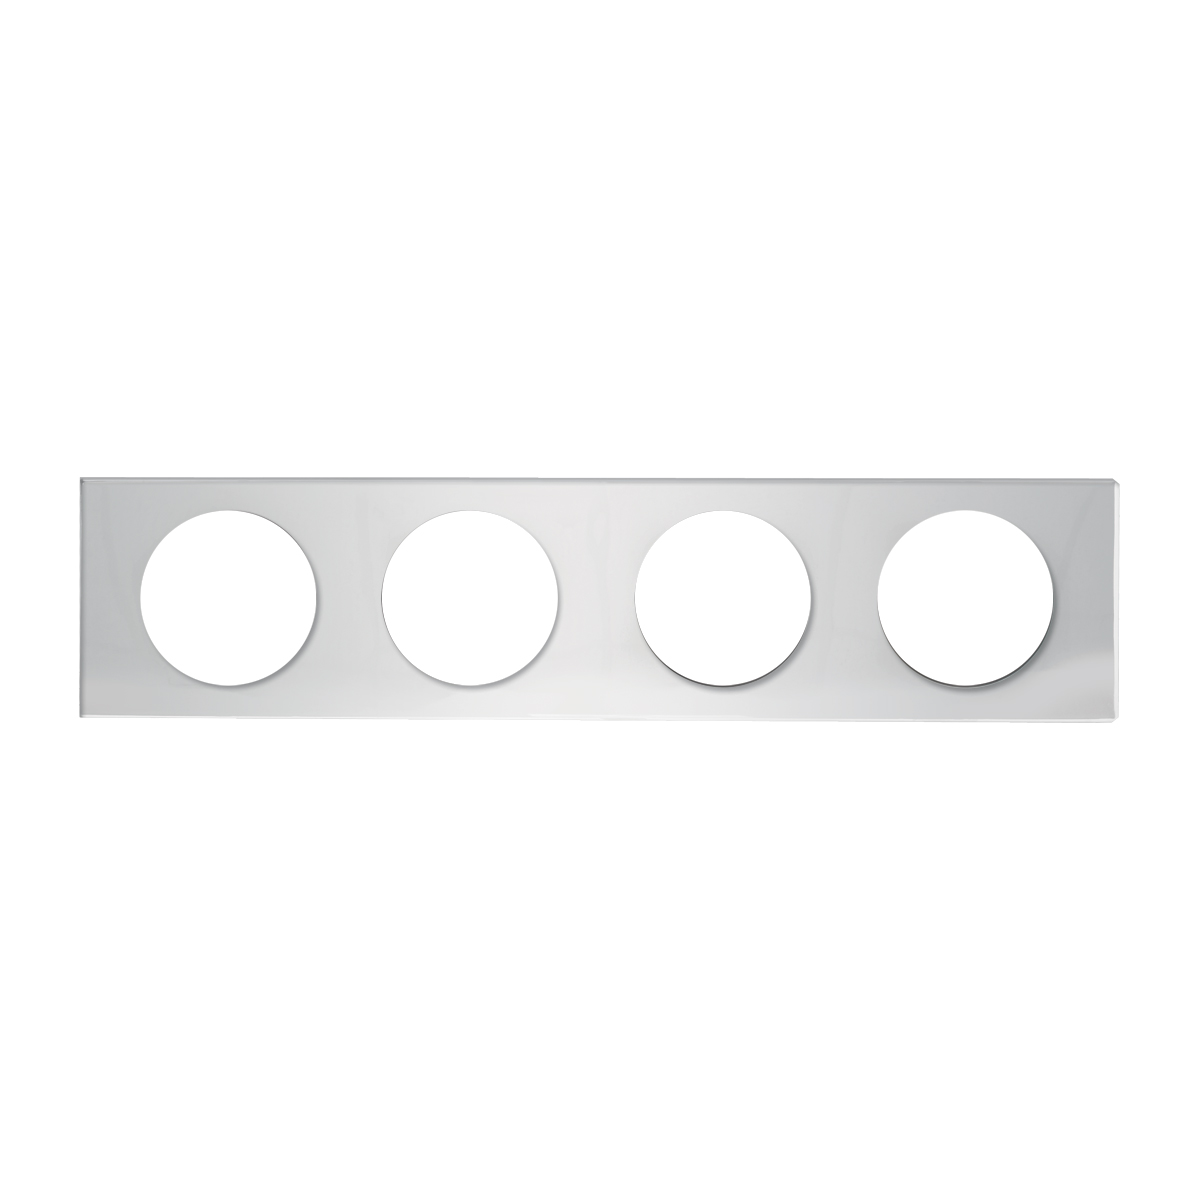 Chrome Plated Steel Panel Rear Center Light Panel Only